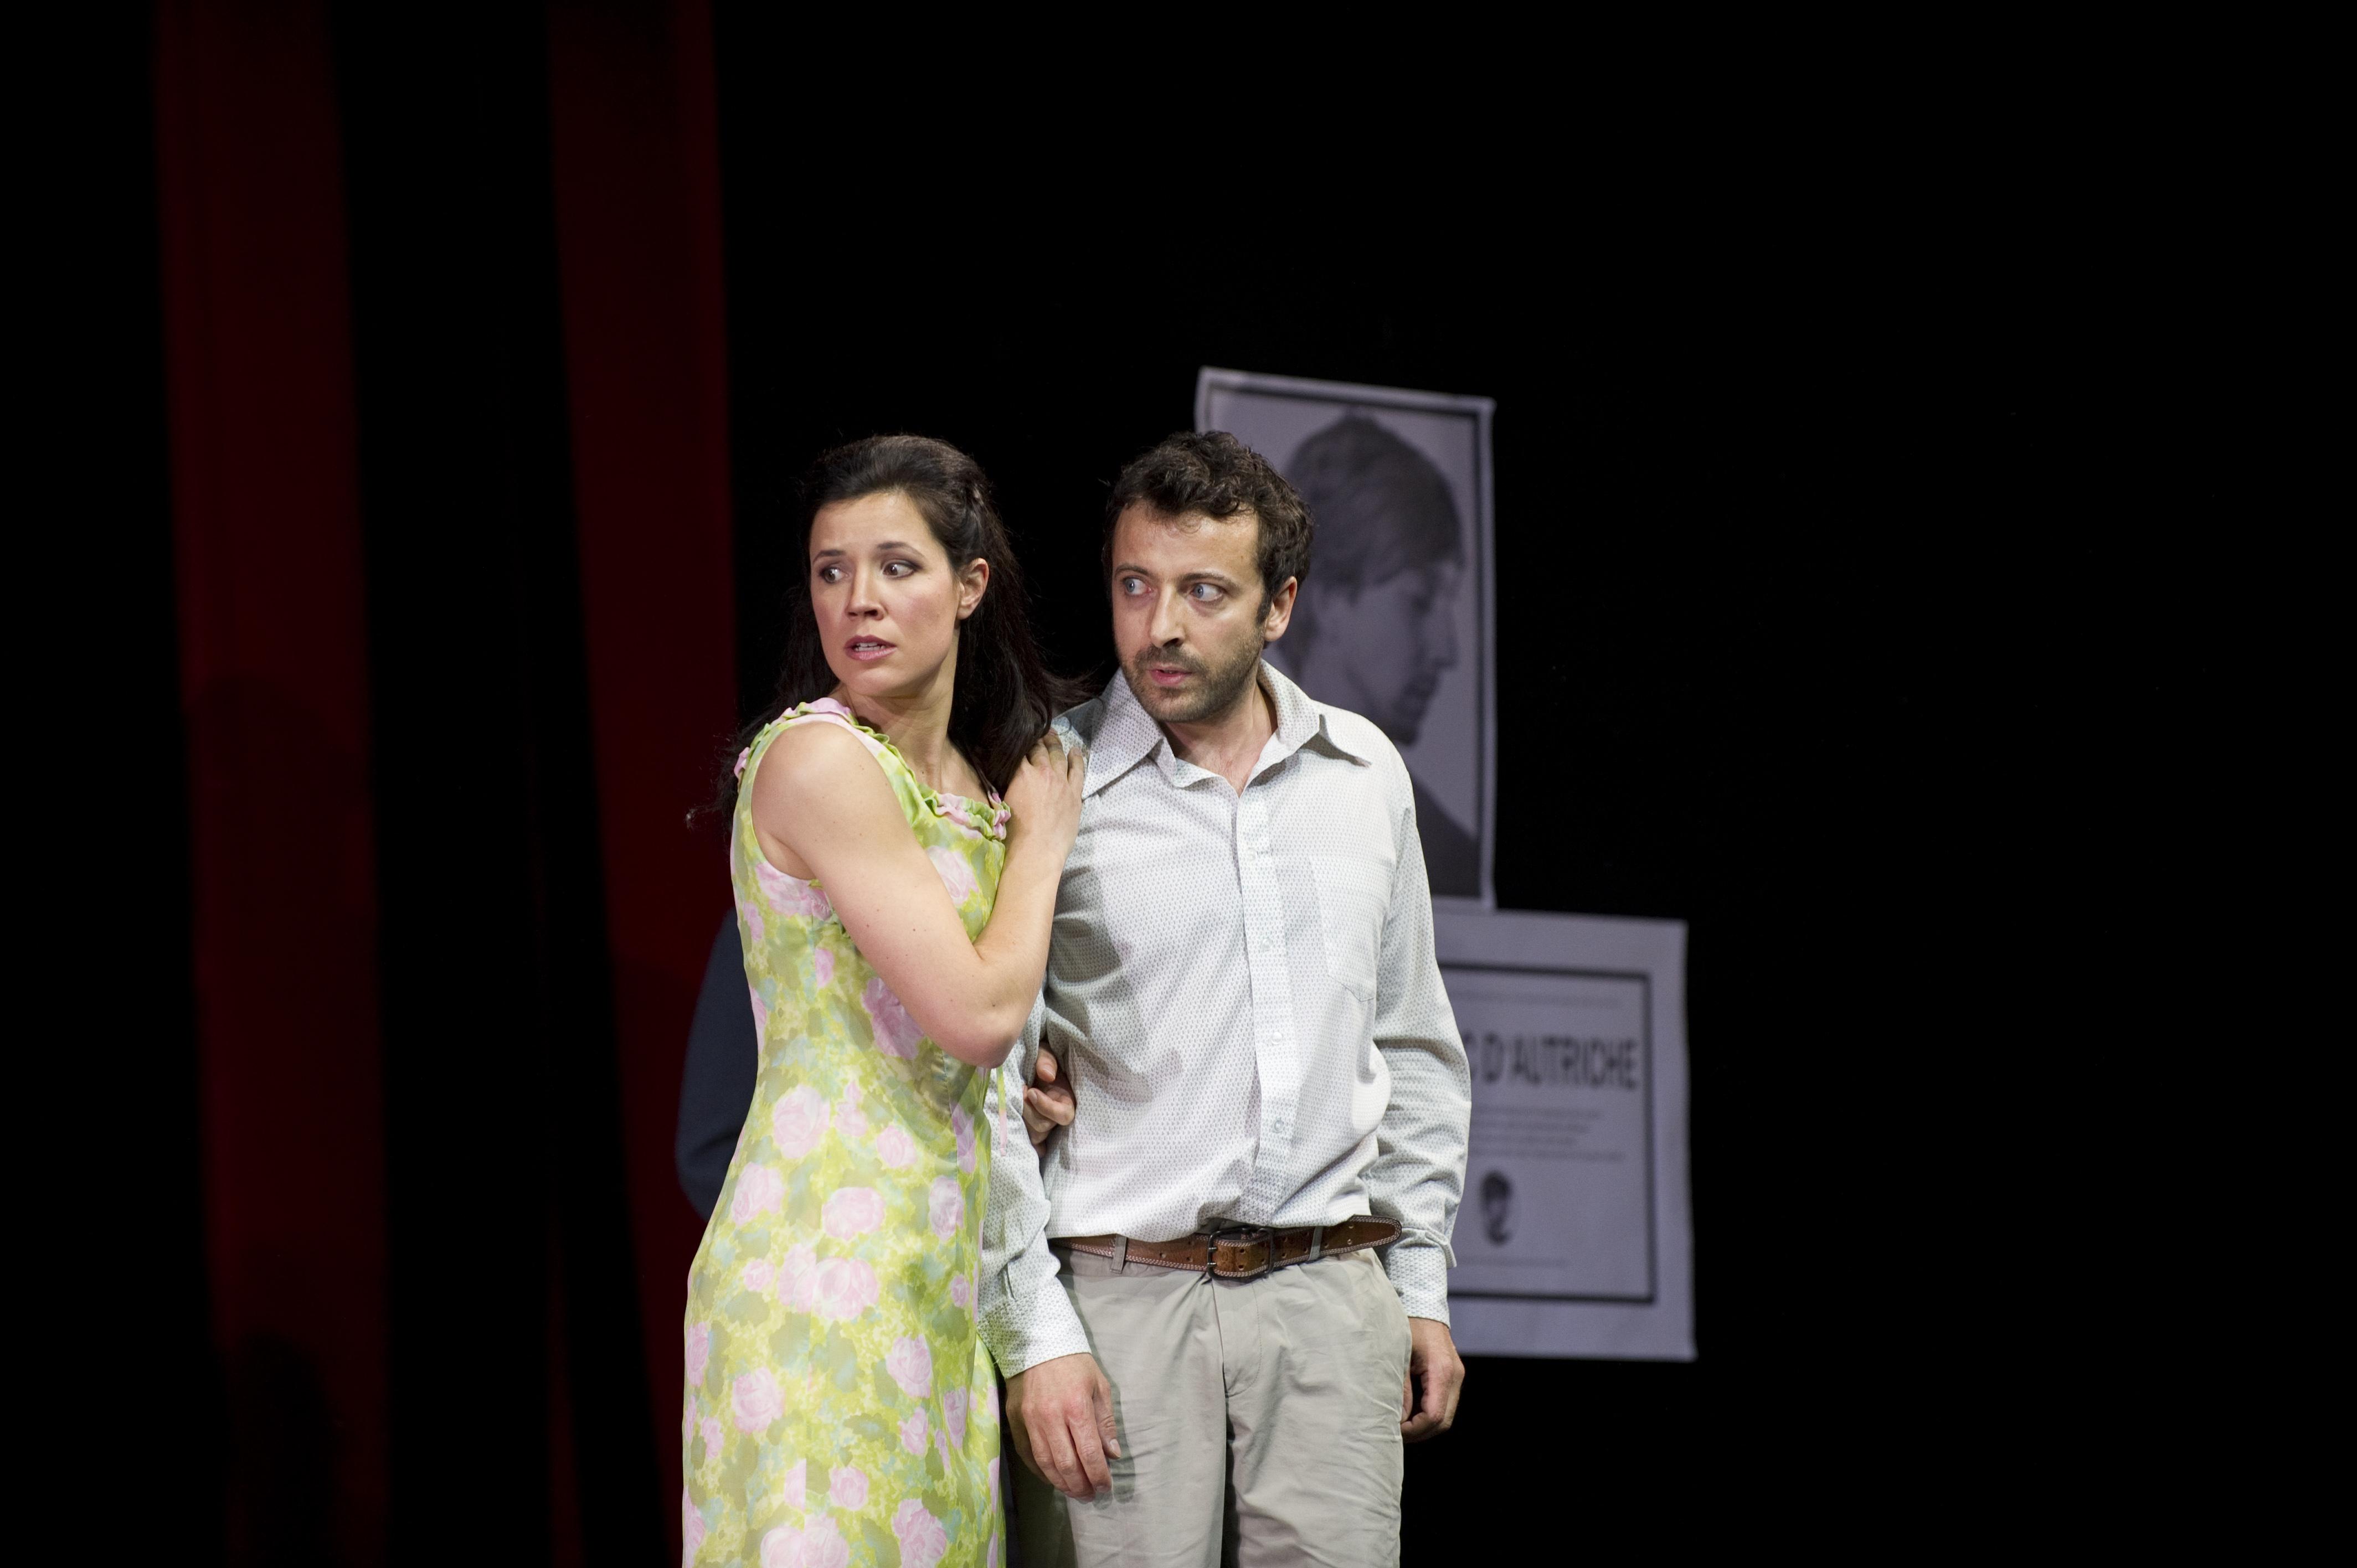 Ninetta-I vespri siciliani/Verdi